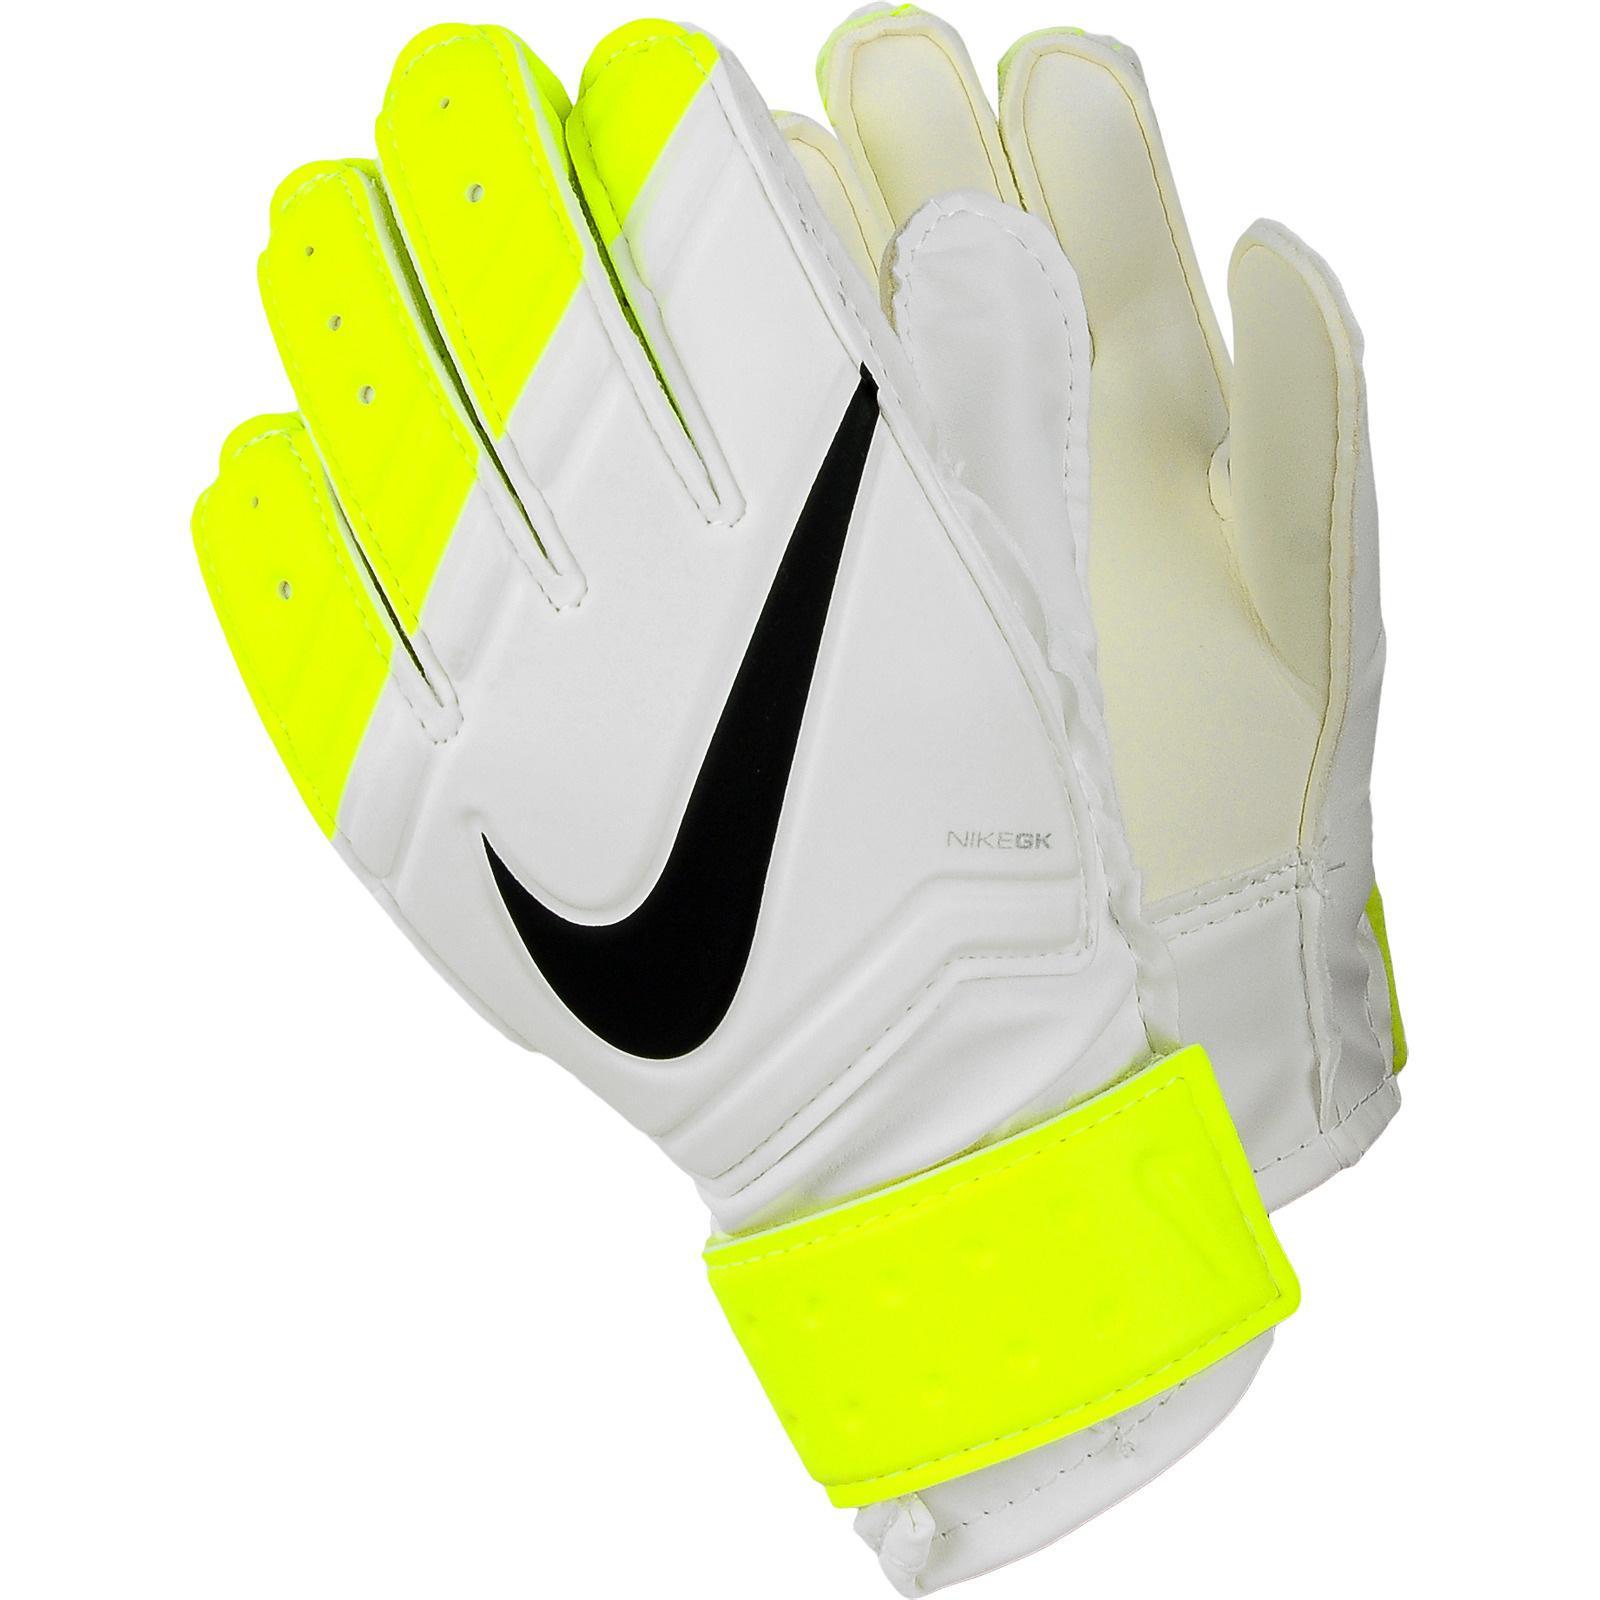 Nike Kids Goalkeeper Gloves - White/Volt - Tennisnuts.com